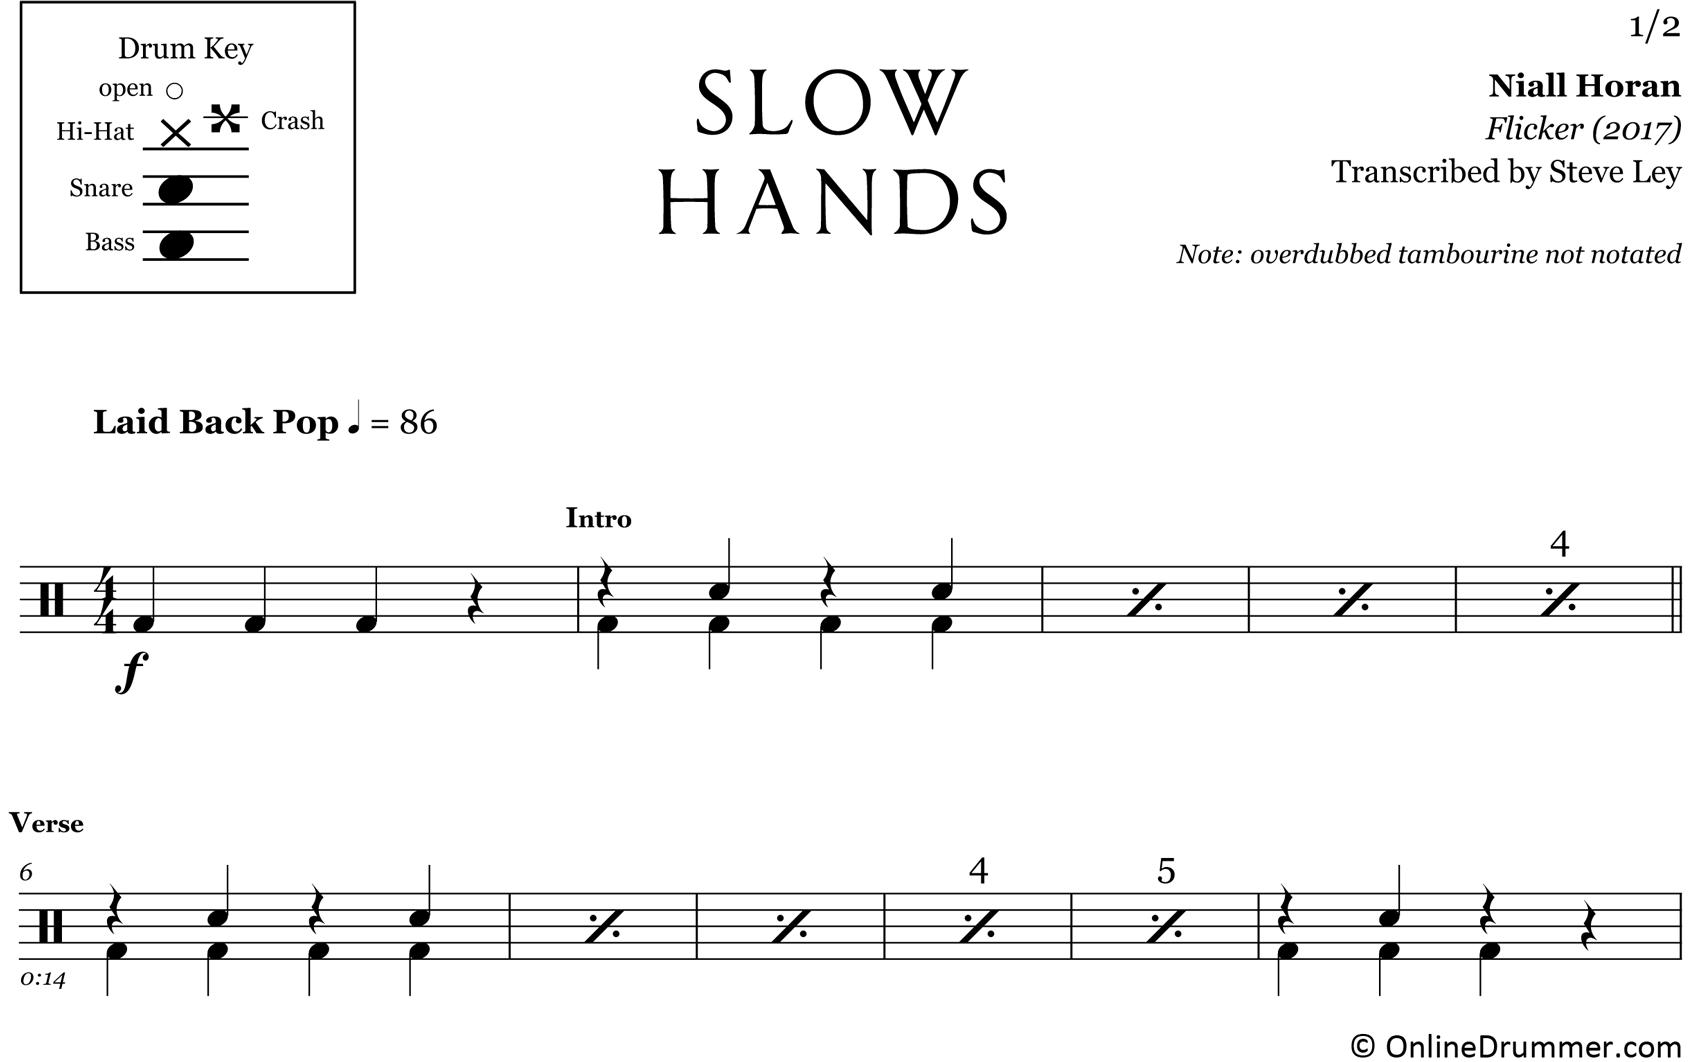 Slow Hands - Niall Horan - Drum Sheet Music